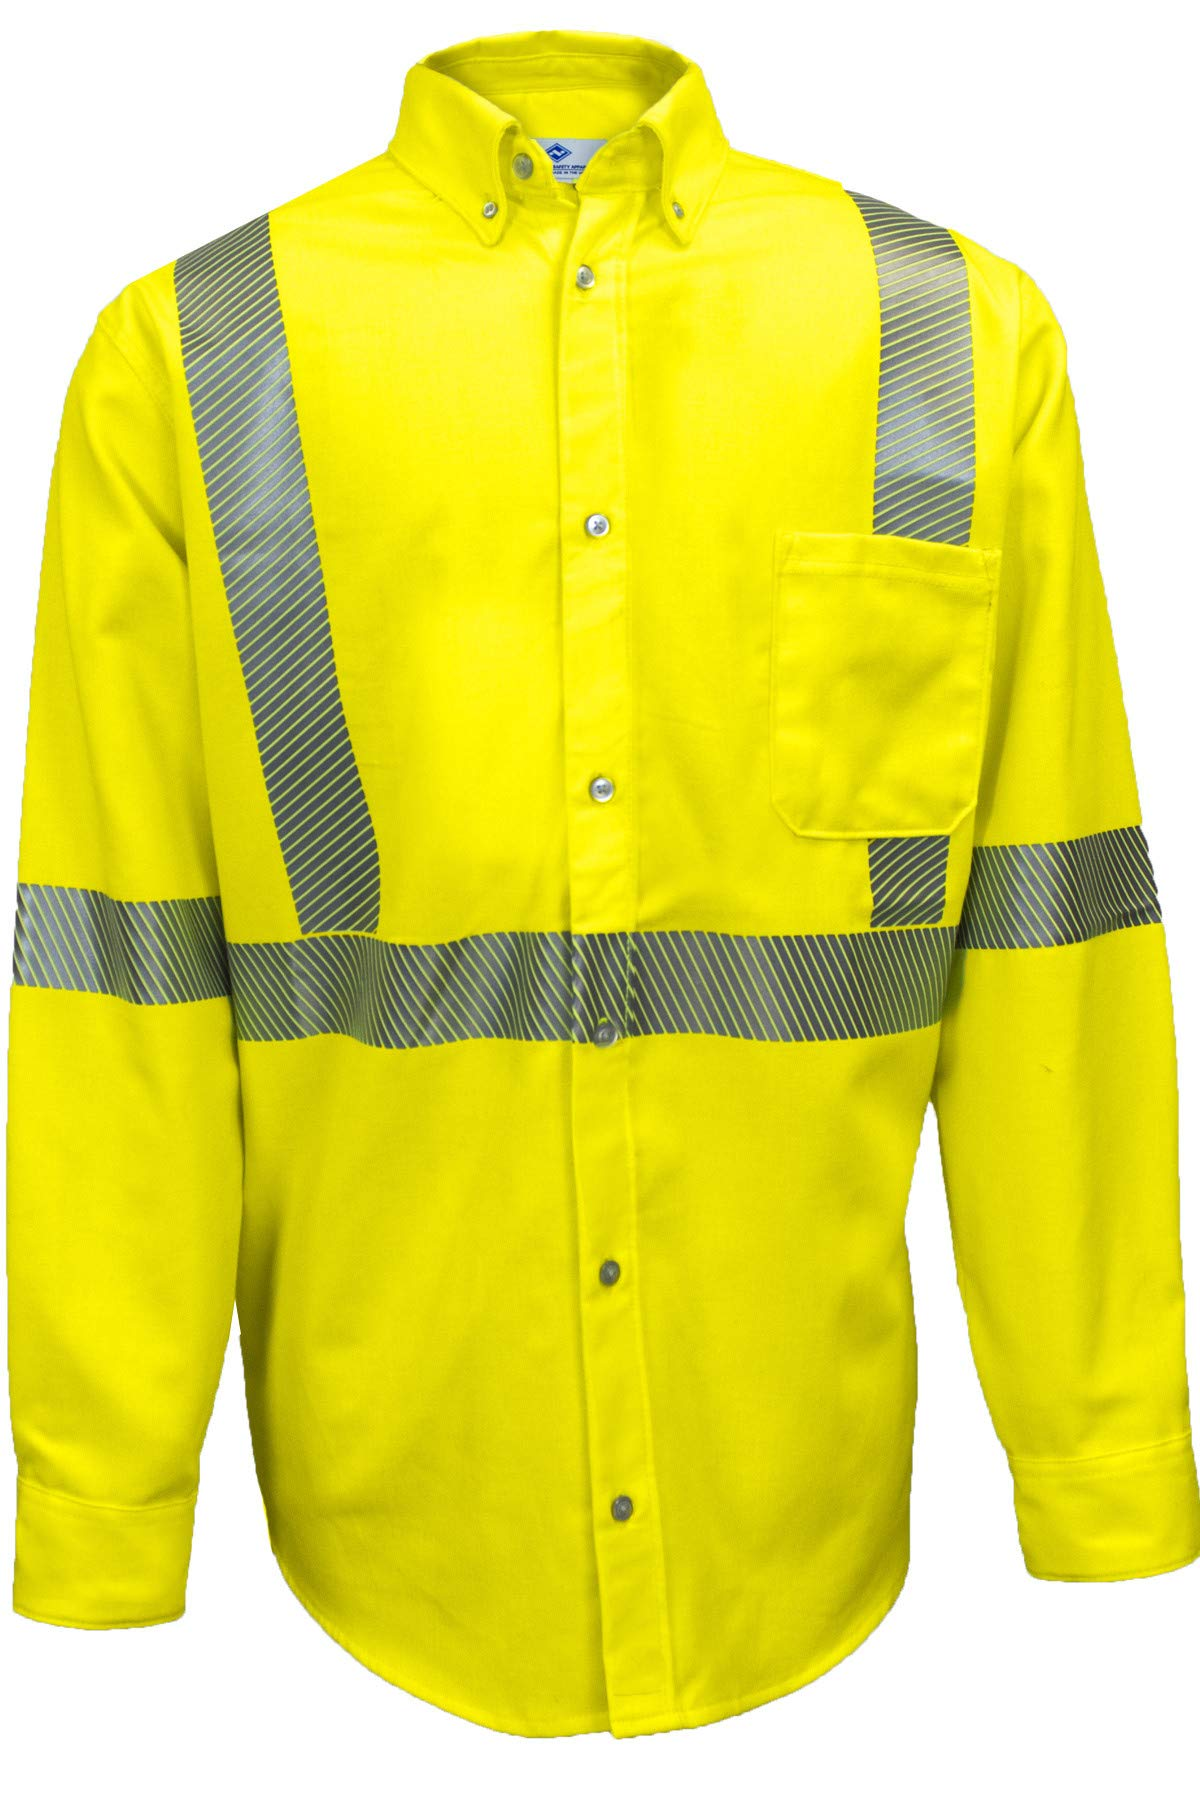 National Safety Apparel SHRTD3C3MDRG FR Ultrasoft Hi Vis Class 3 Work Shirt, Medium, Fluorescent Yellow